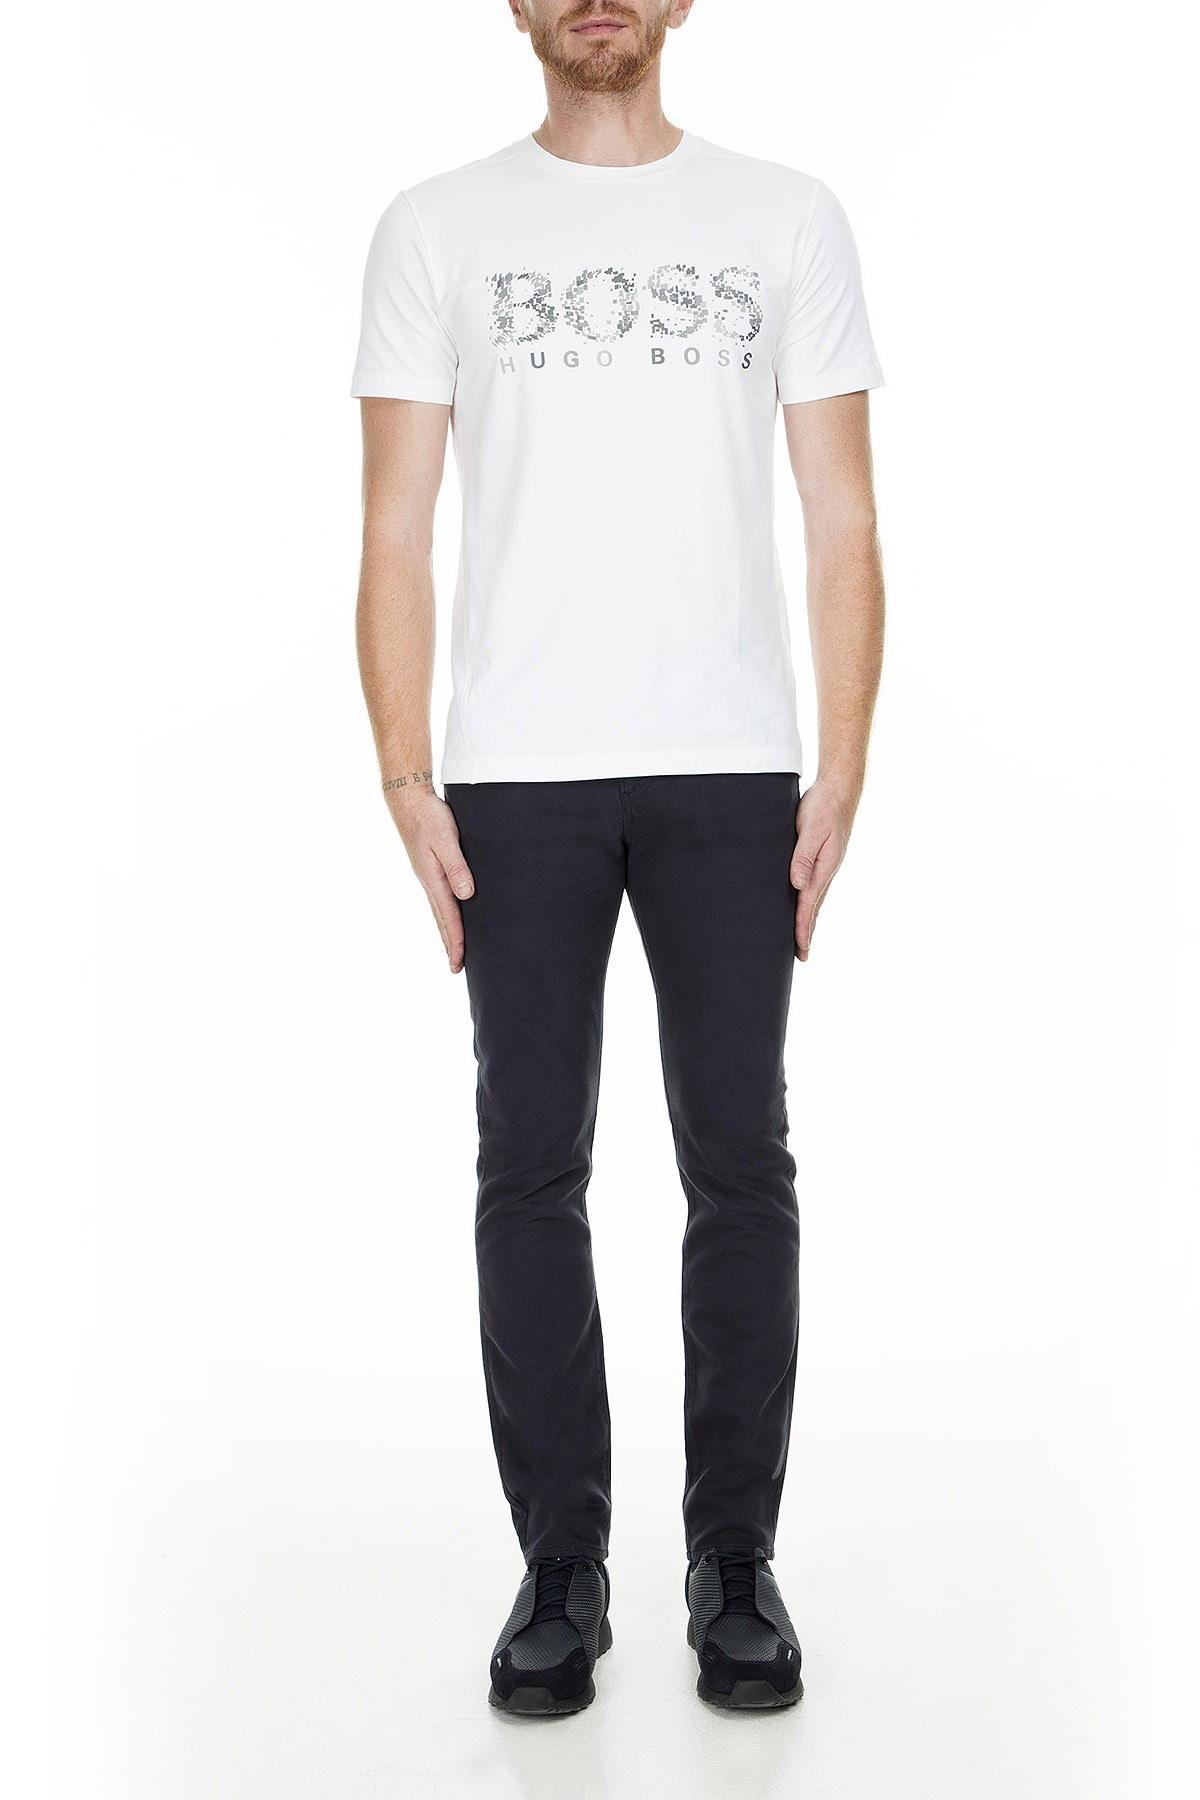 Hugo Boss Jeans Erkek Pamuklu Pantolon 50415317 402 LACİVERT